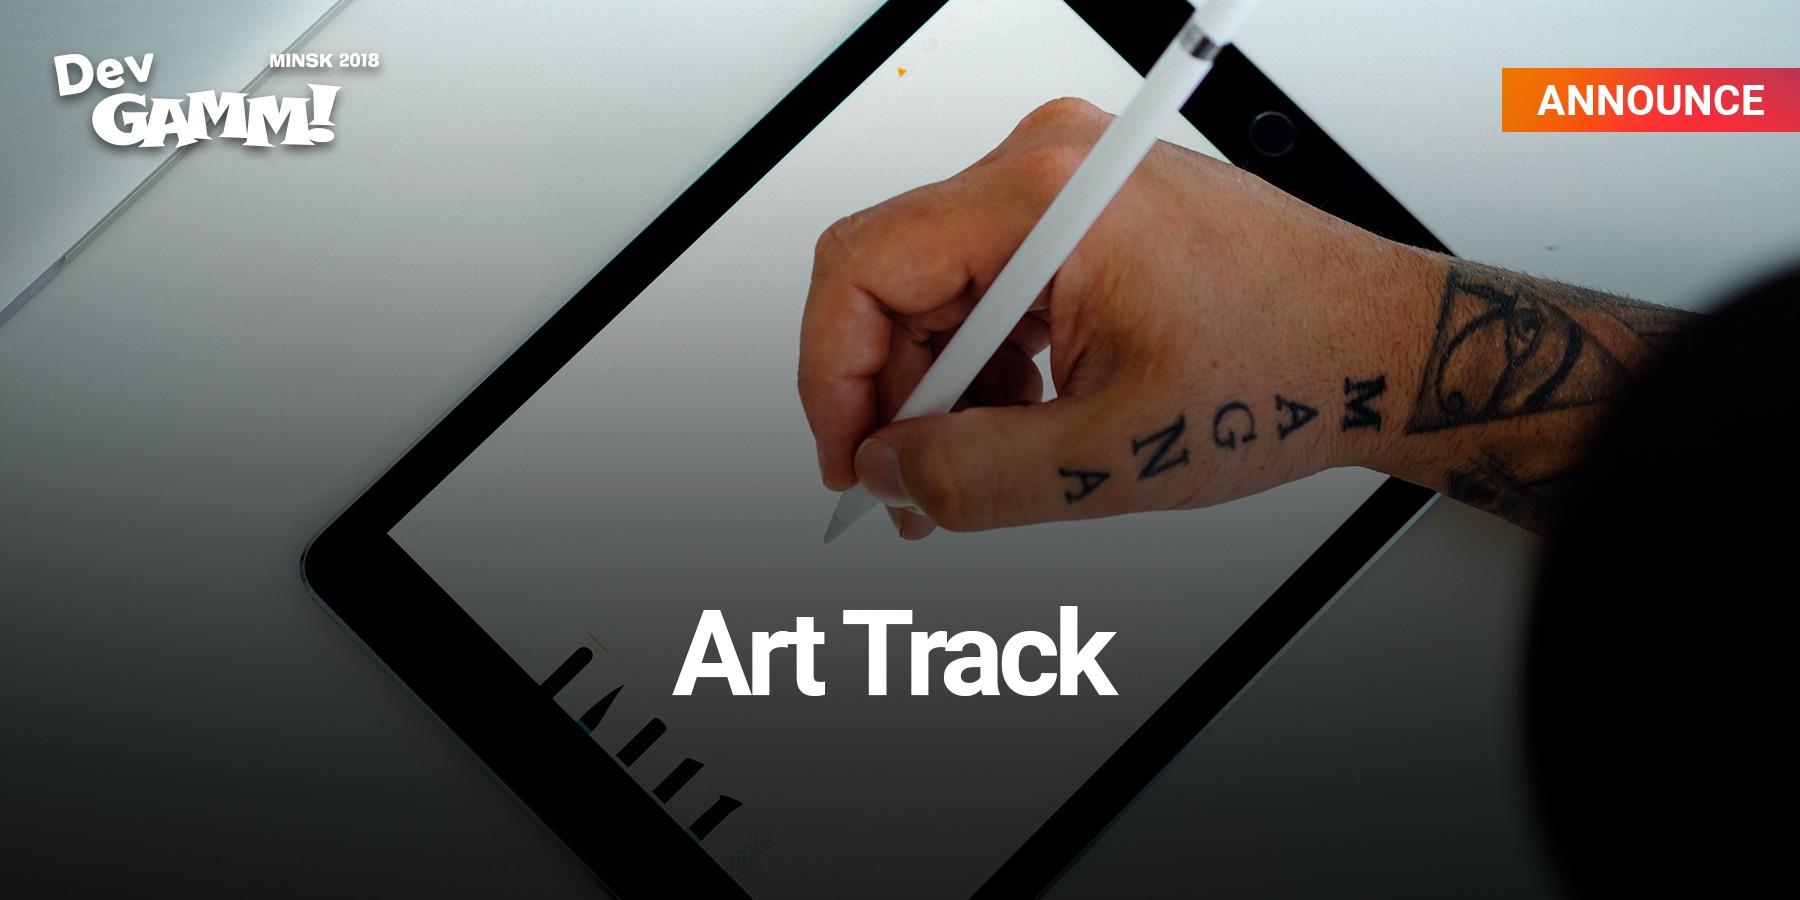 Art Track at DevGAMM Minsk